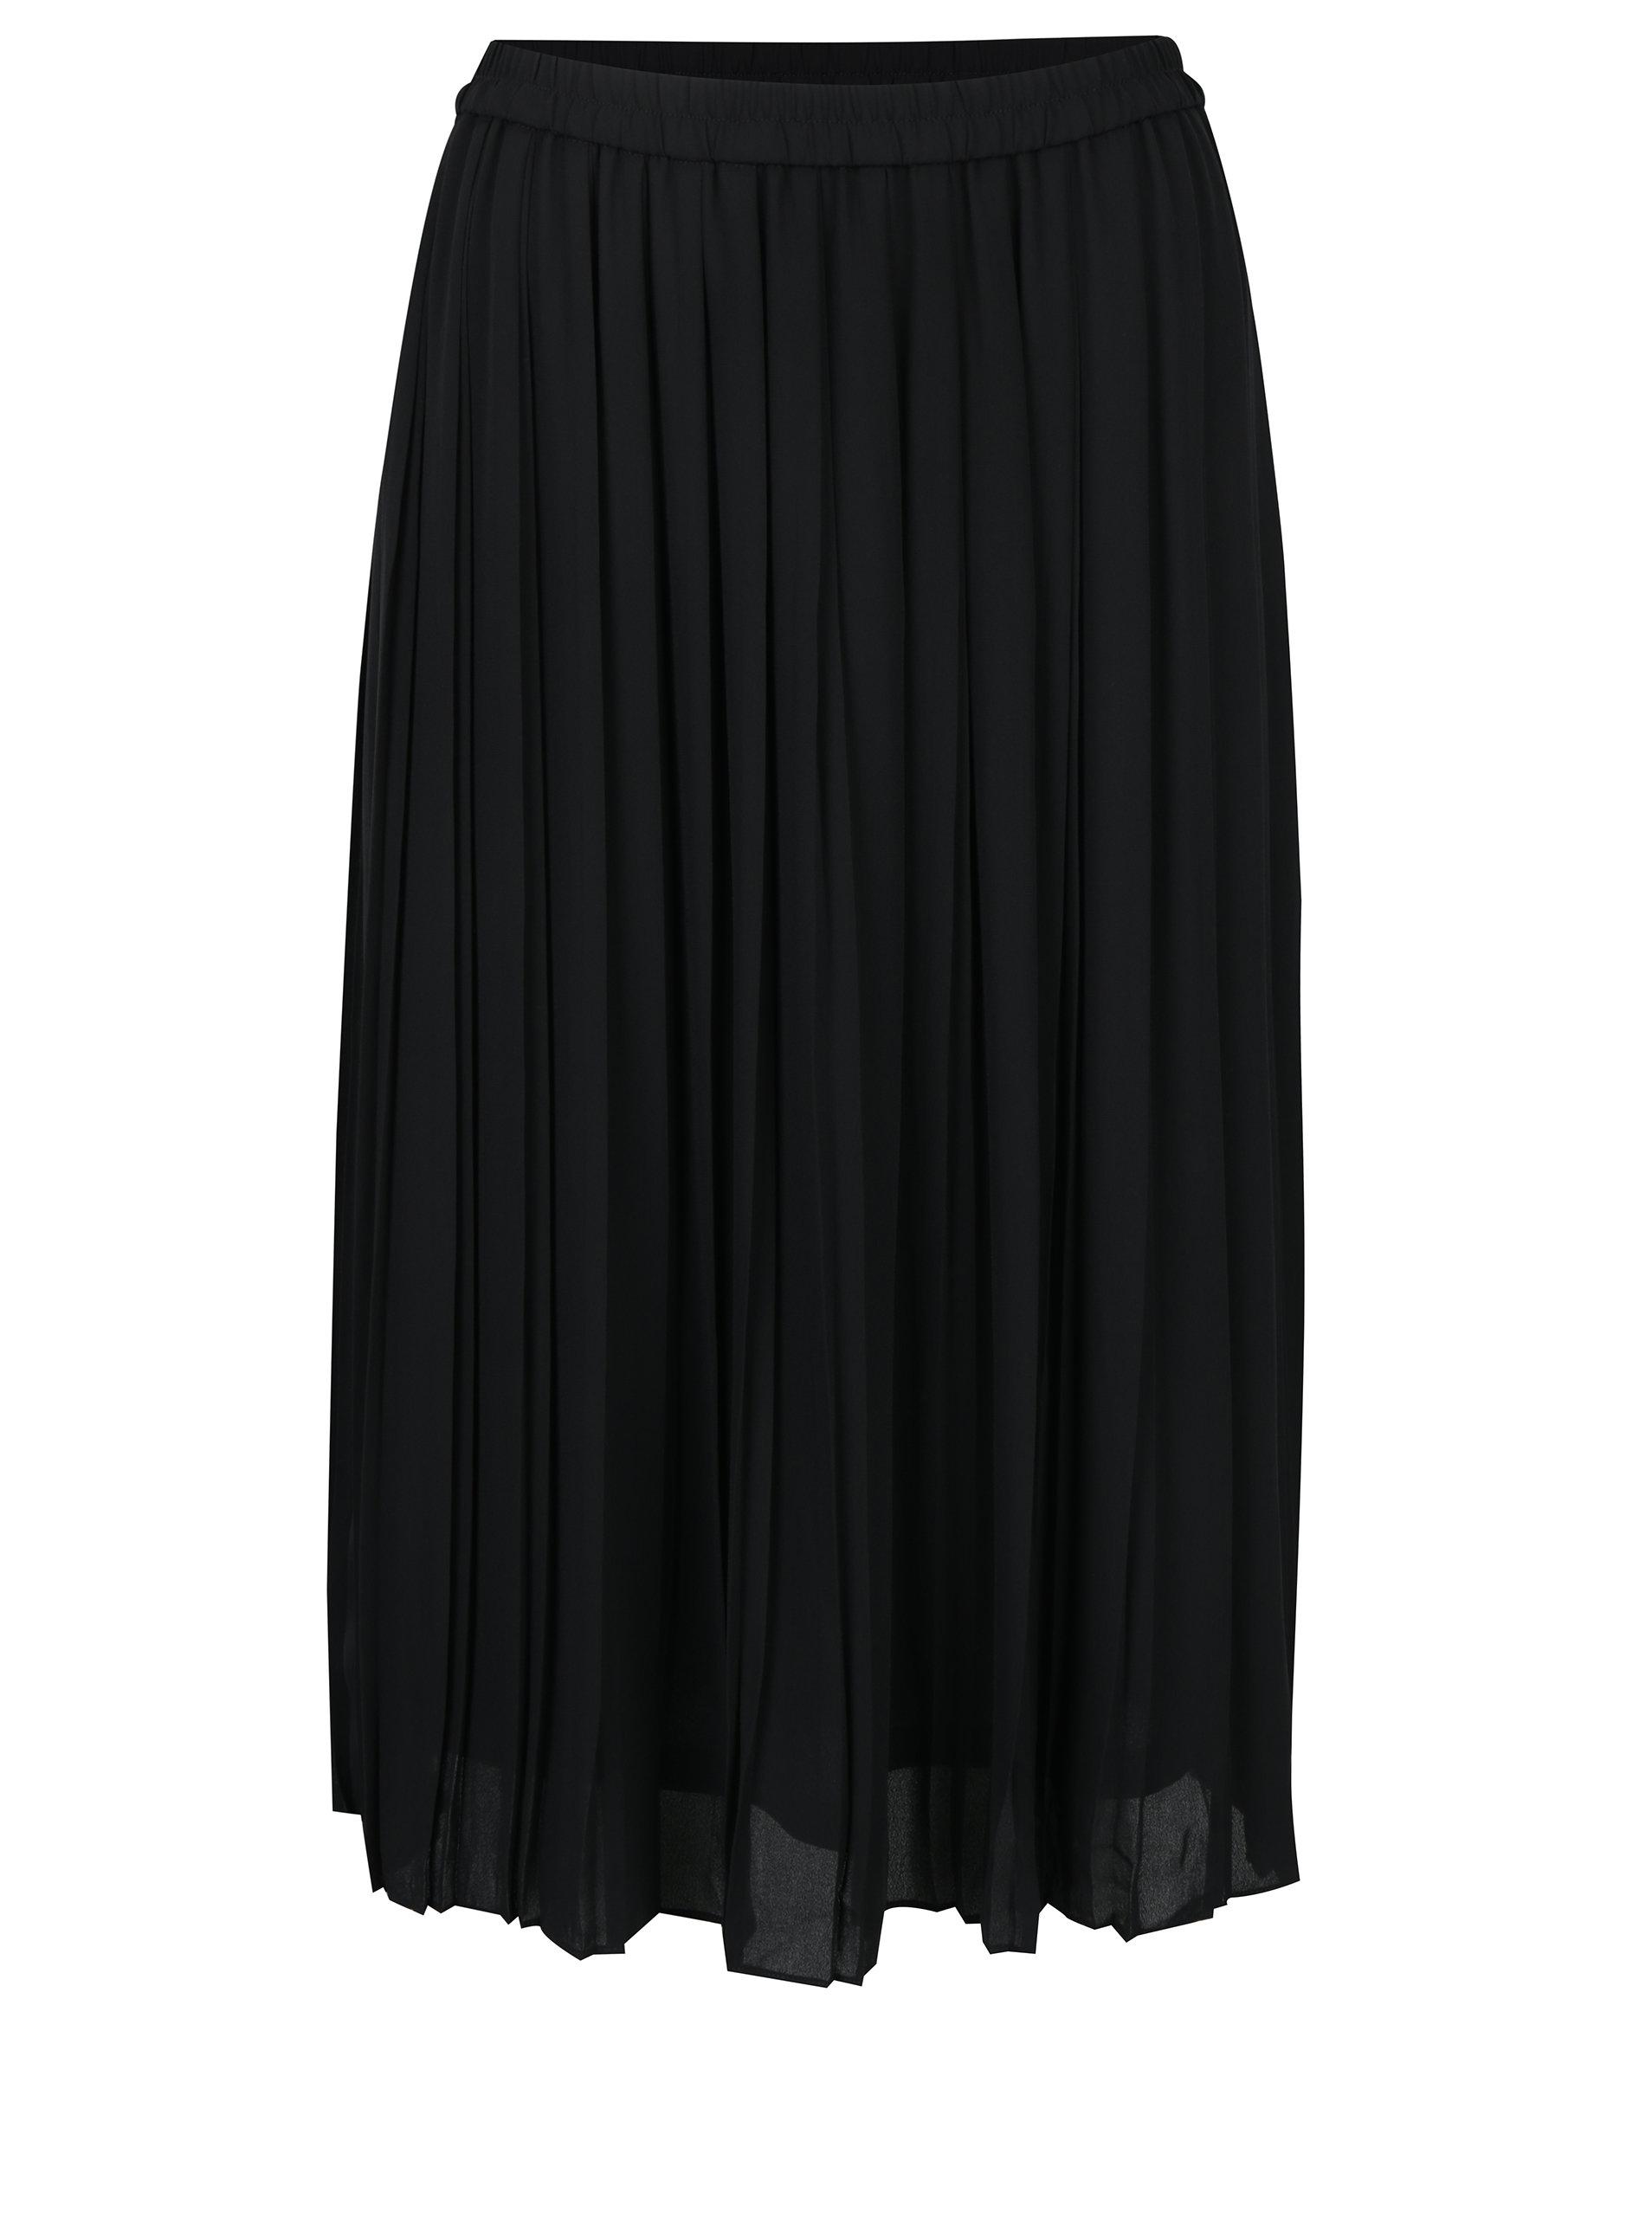 fbaa9a65a814 Černá plisovaná sukně VERO MODA Swing ...